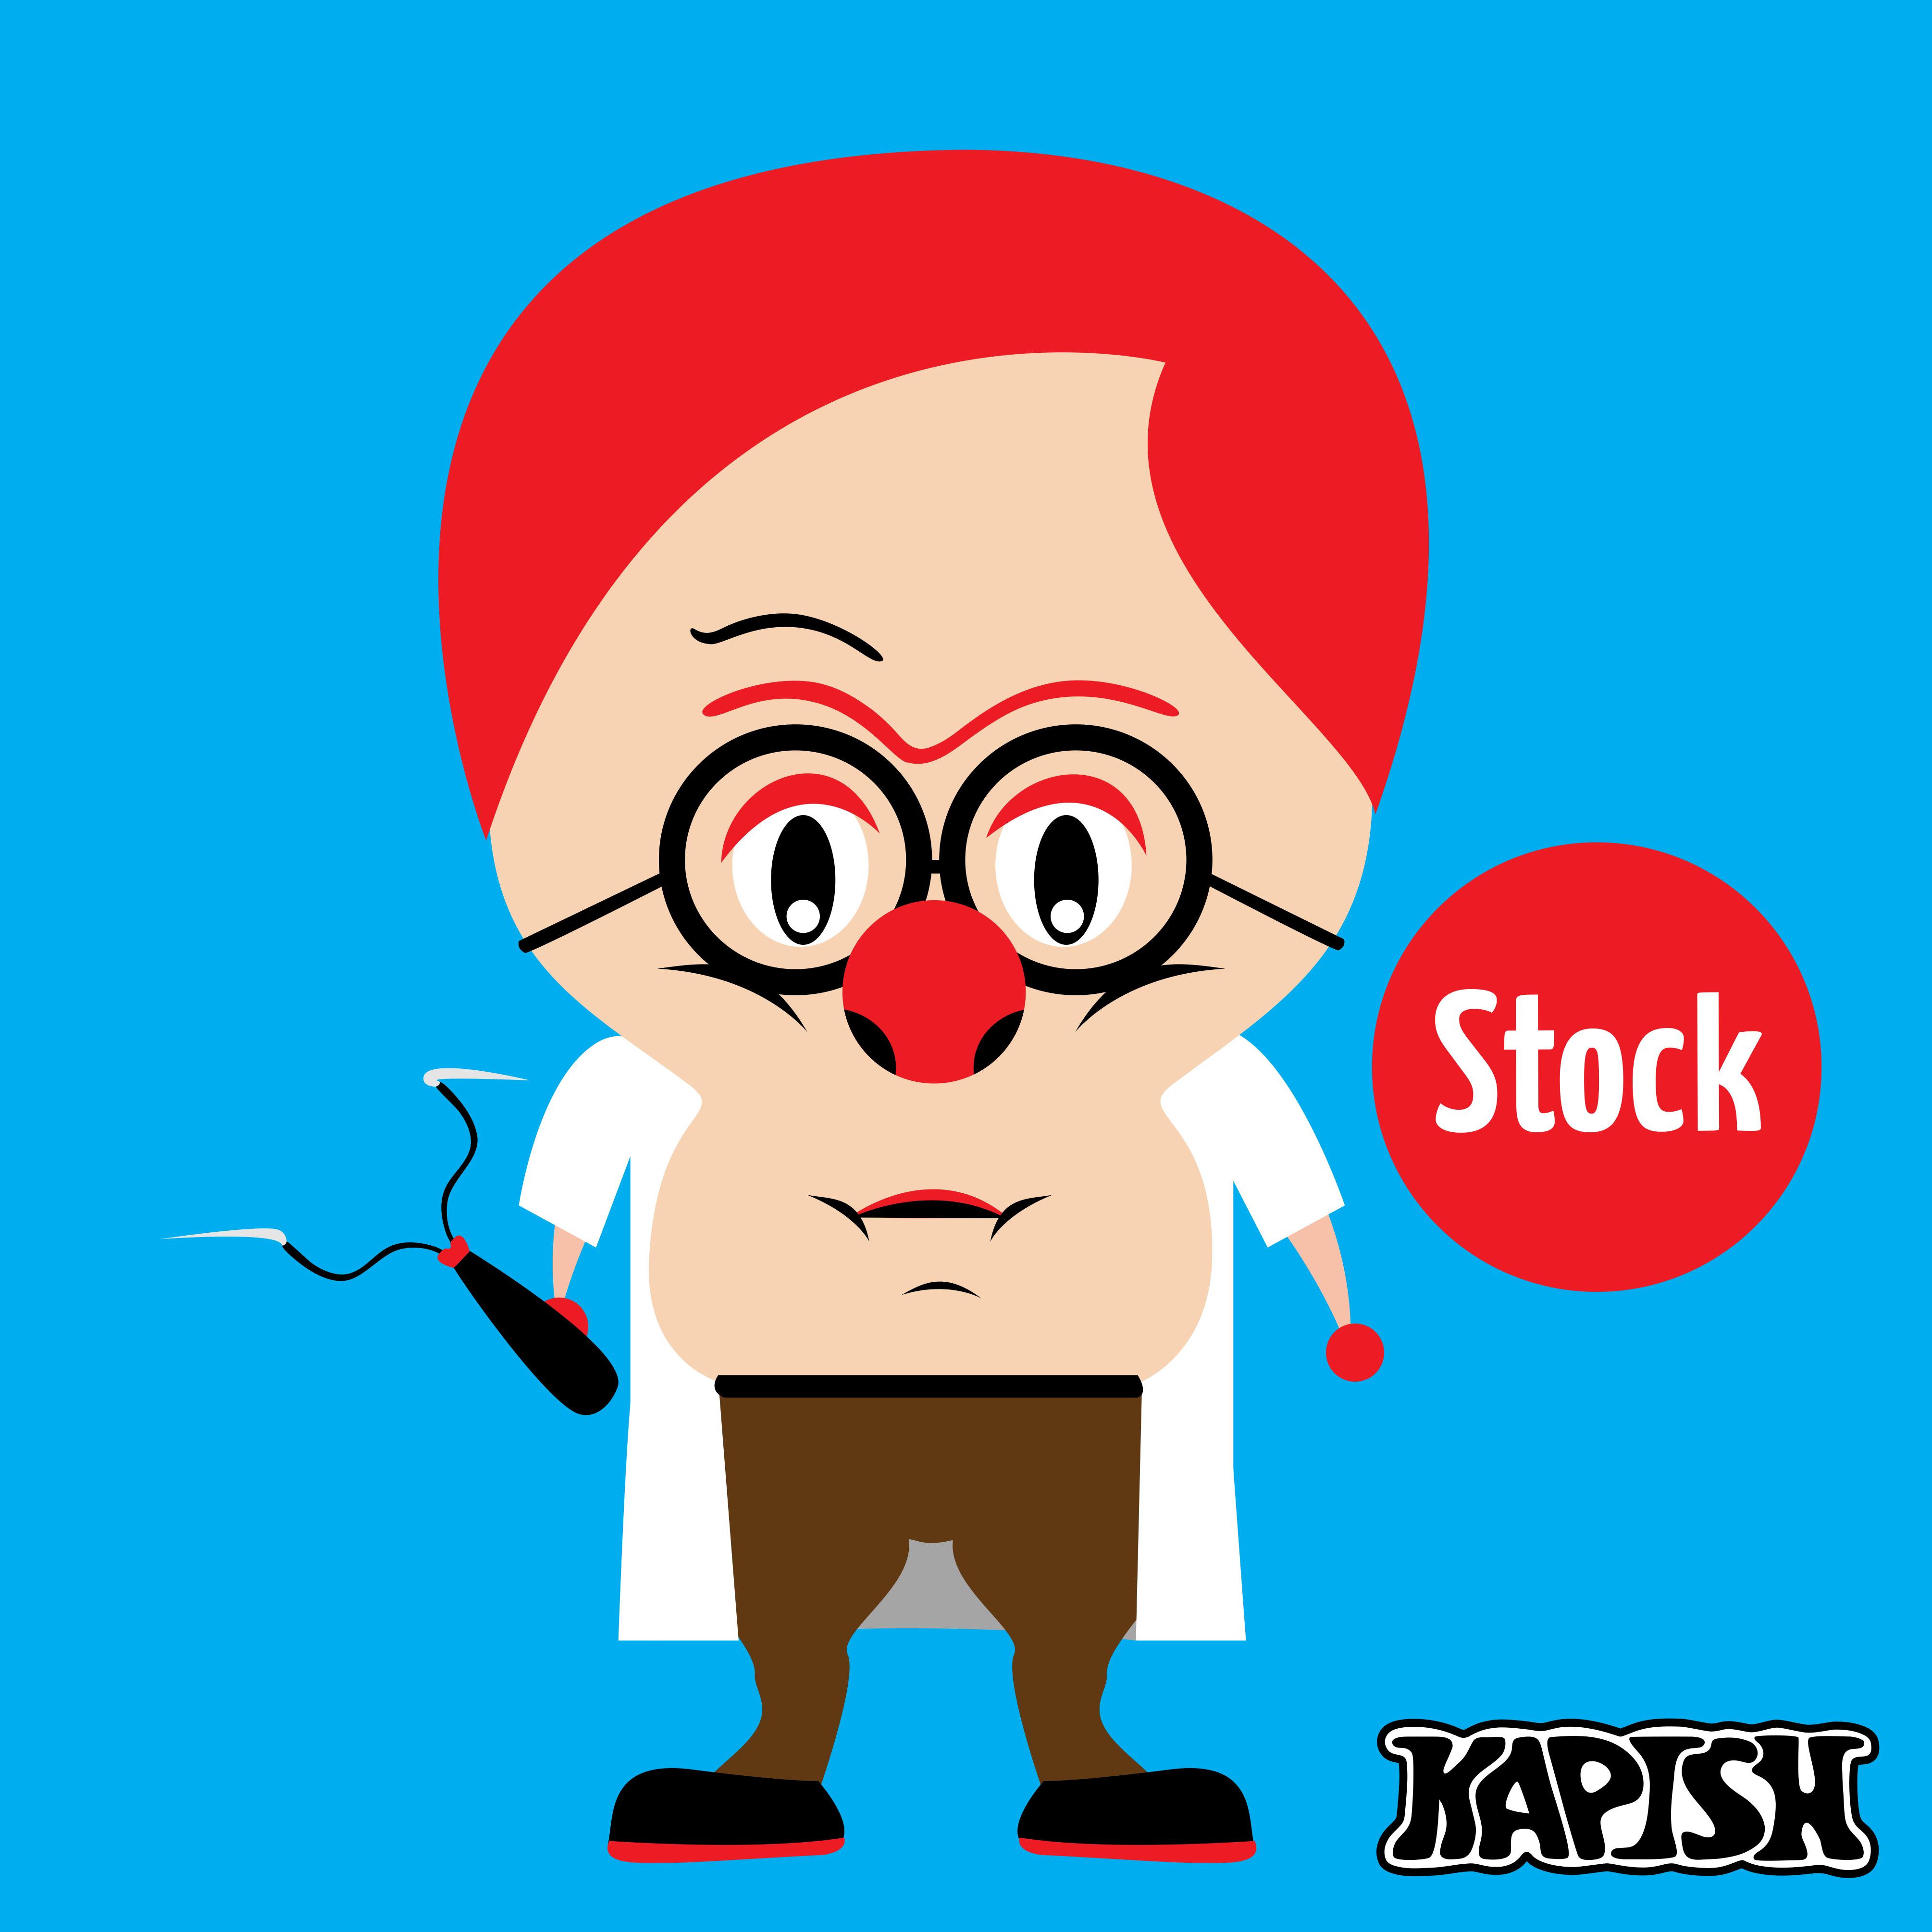 Kapish - Stock